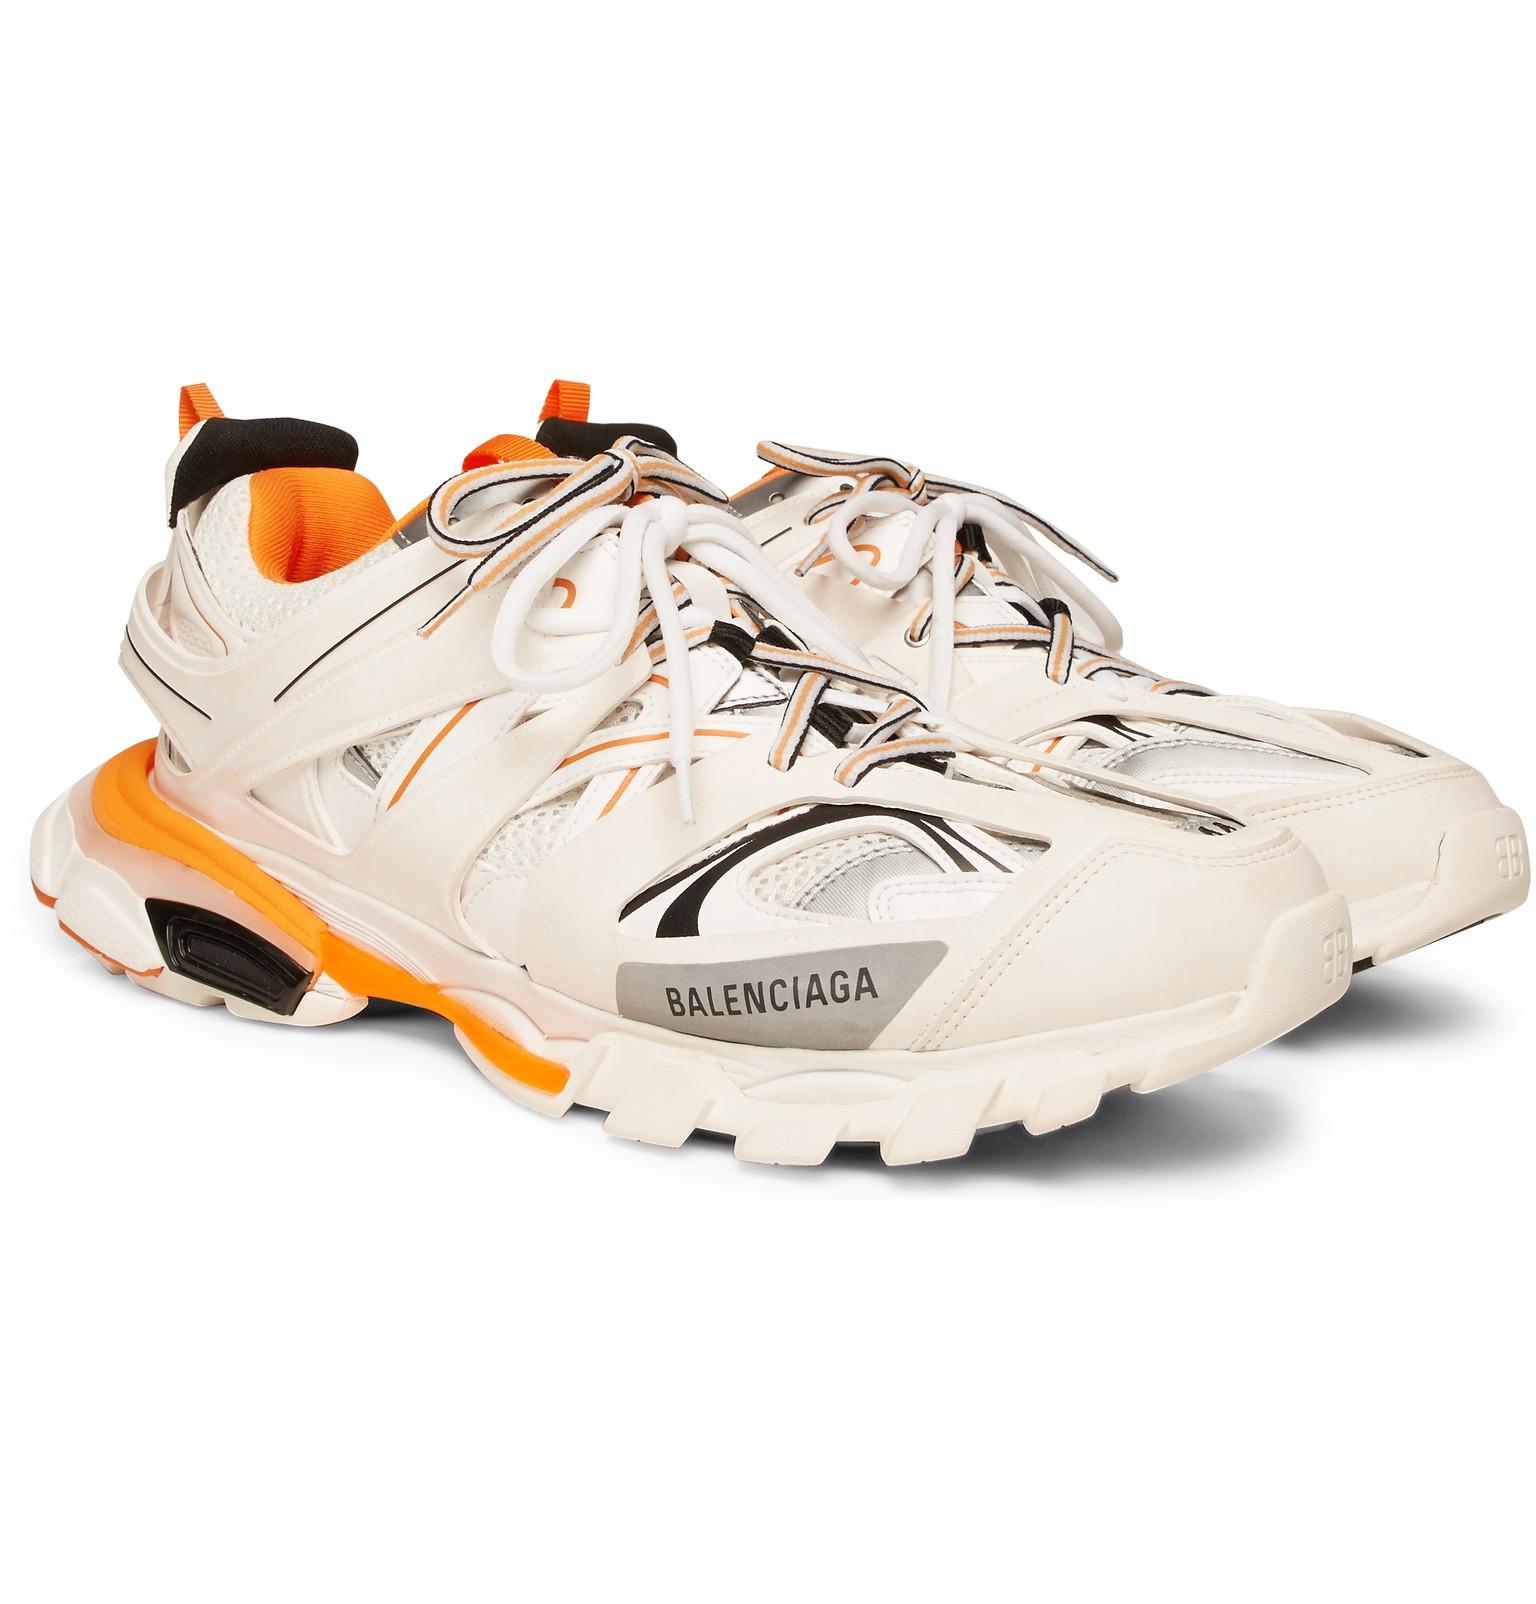 4b58c851ded46 Lyst - Balenciaga Track Mesh Running Sneakers in White for Men